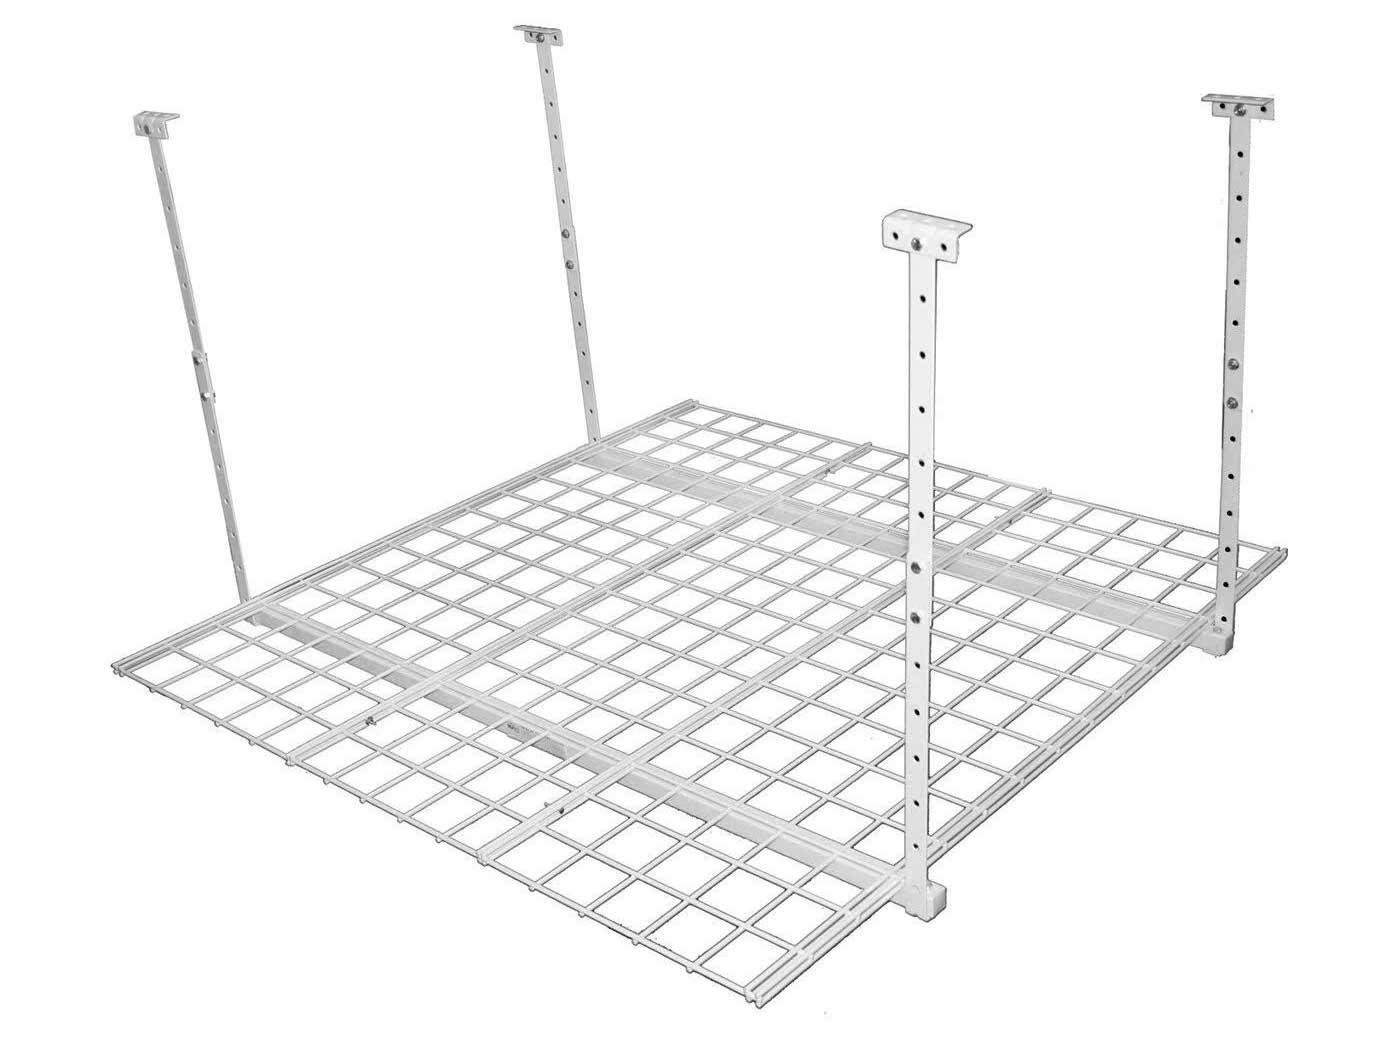 HyLoft 45-Inch by 45-Inch Overhead Storage System, Ceiling Mount Garage Organization Rack, White